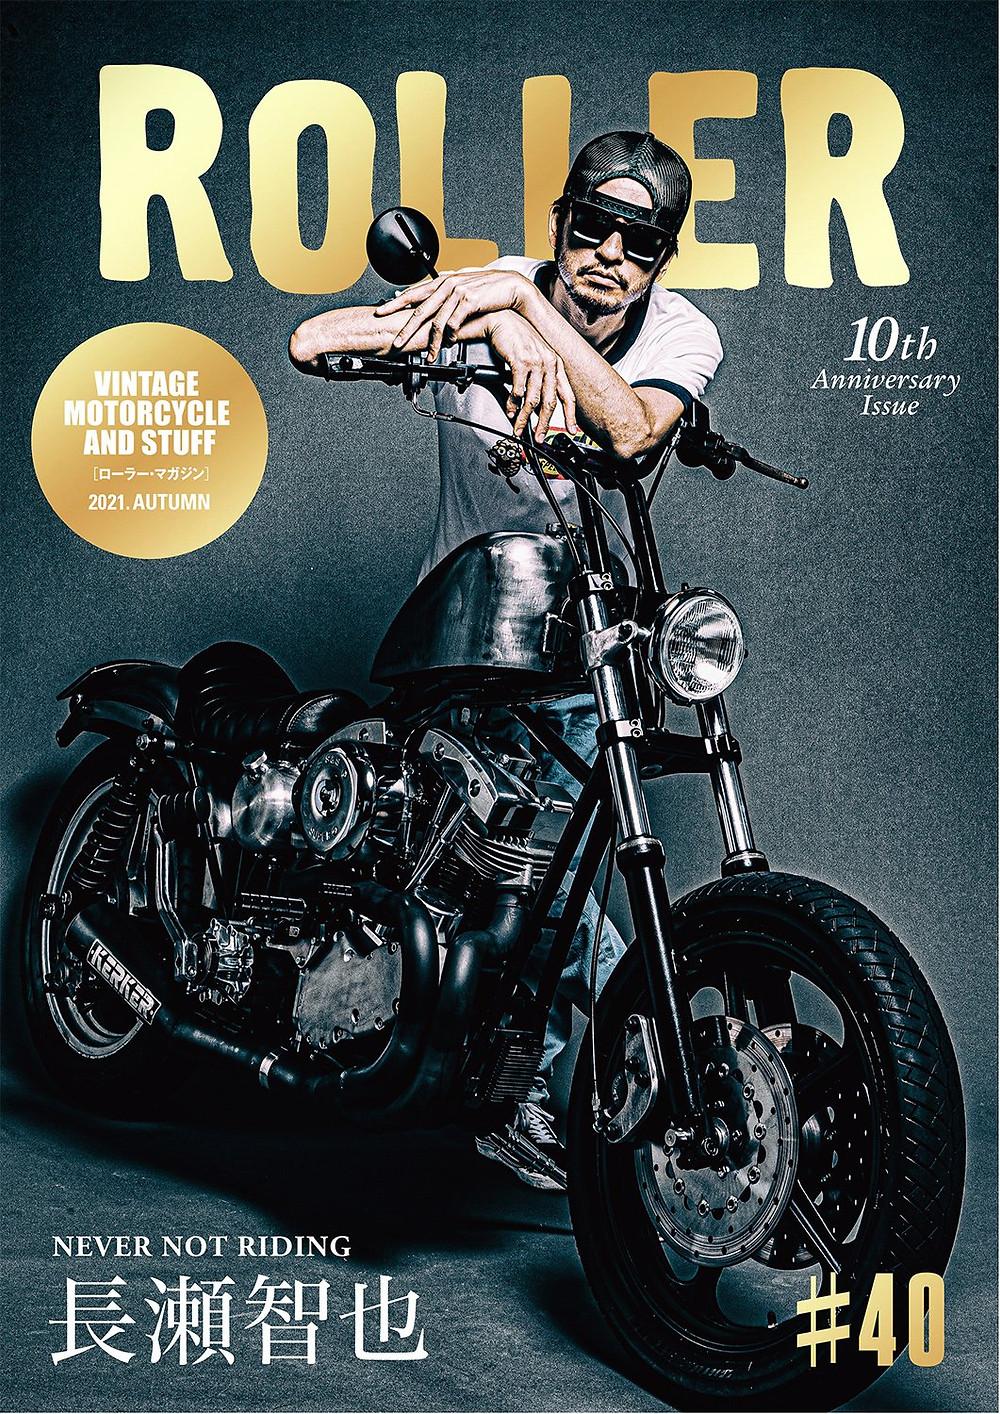 ROLLER MAGAZINE VOL.40 10th ANNIVERSARY ISSUE